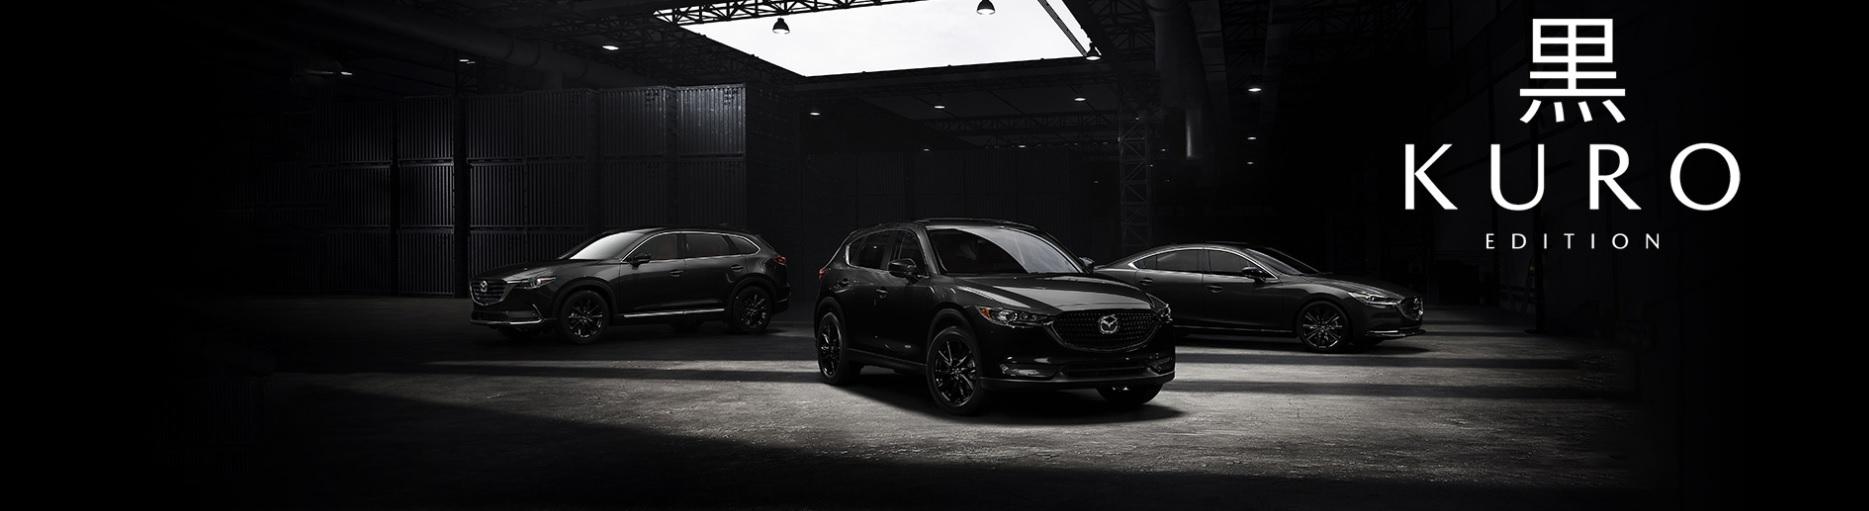 (First Drive) 2021 Mazda CX-9 Kuro Edition 黒 – SUV AWD